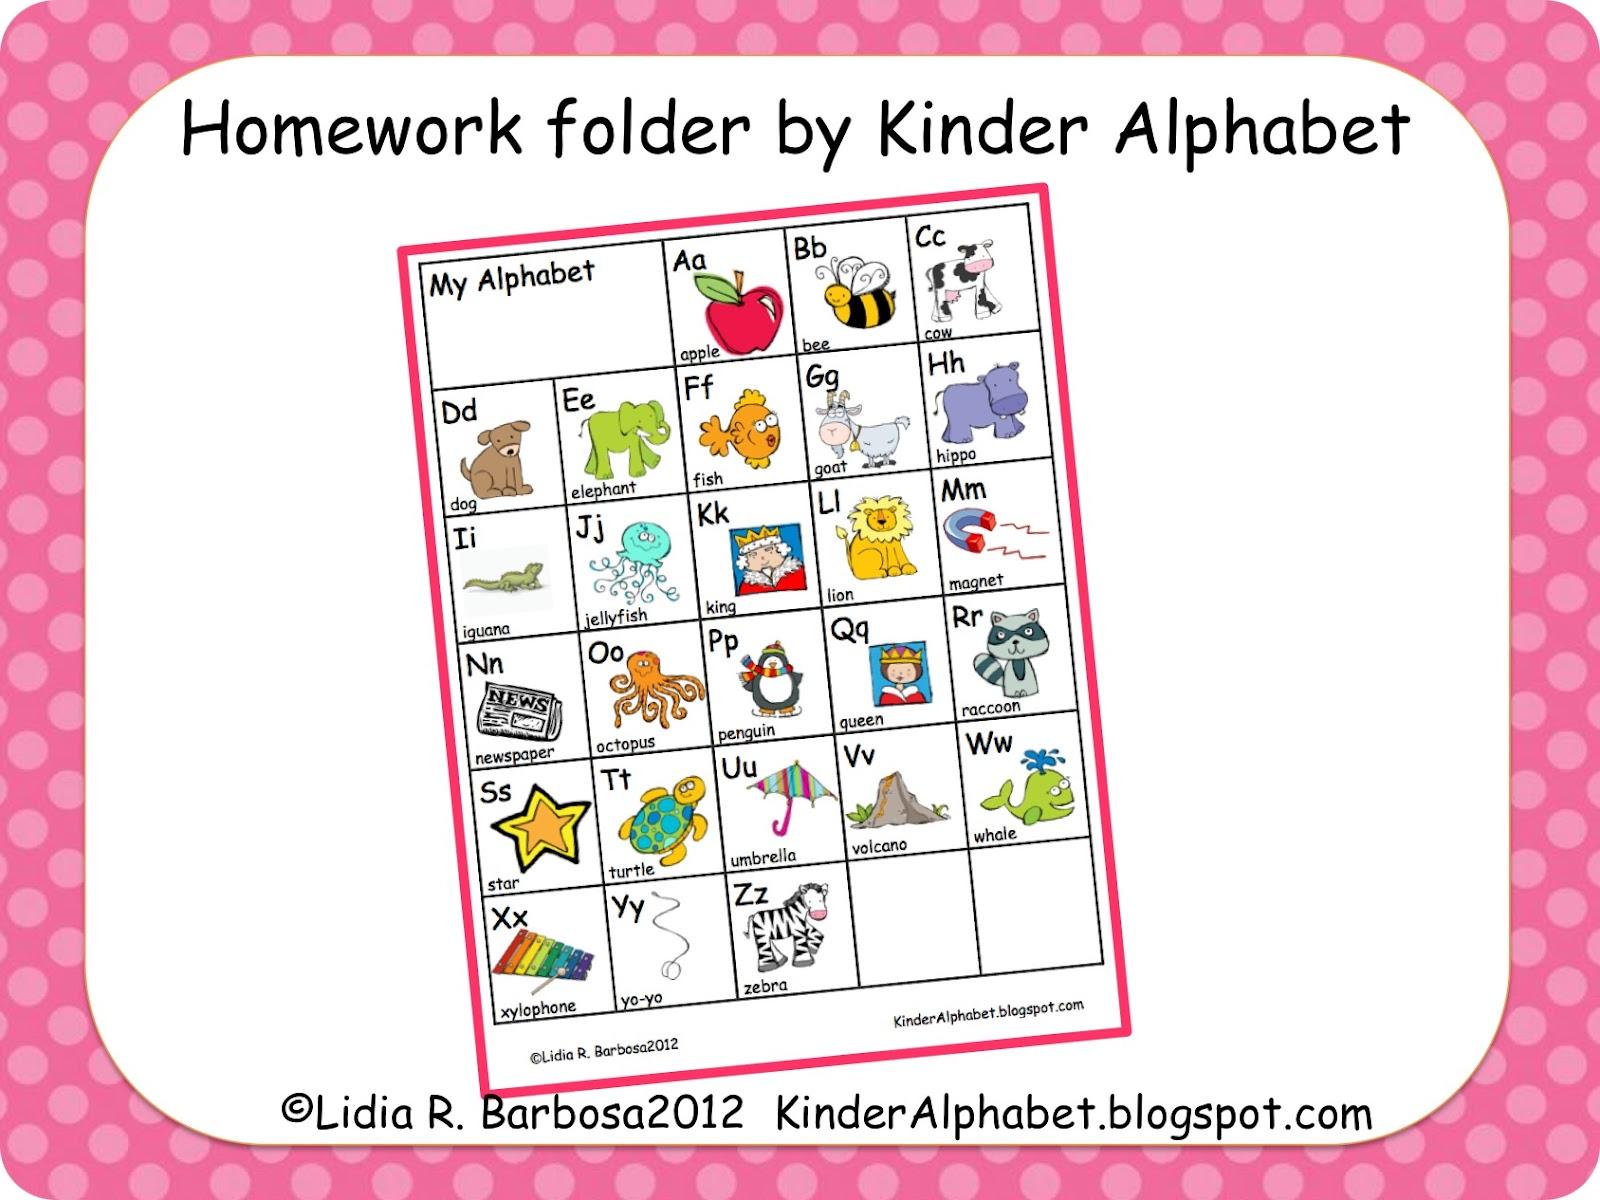 Worksheet Kindergarten Alphabet Chart guest blogger kinder alphabet homework folders miss kindergarten folders